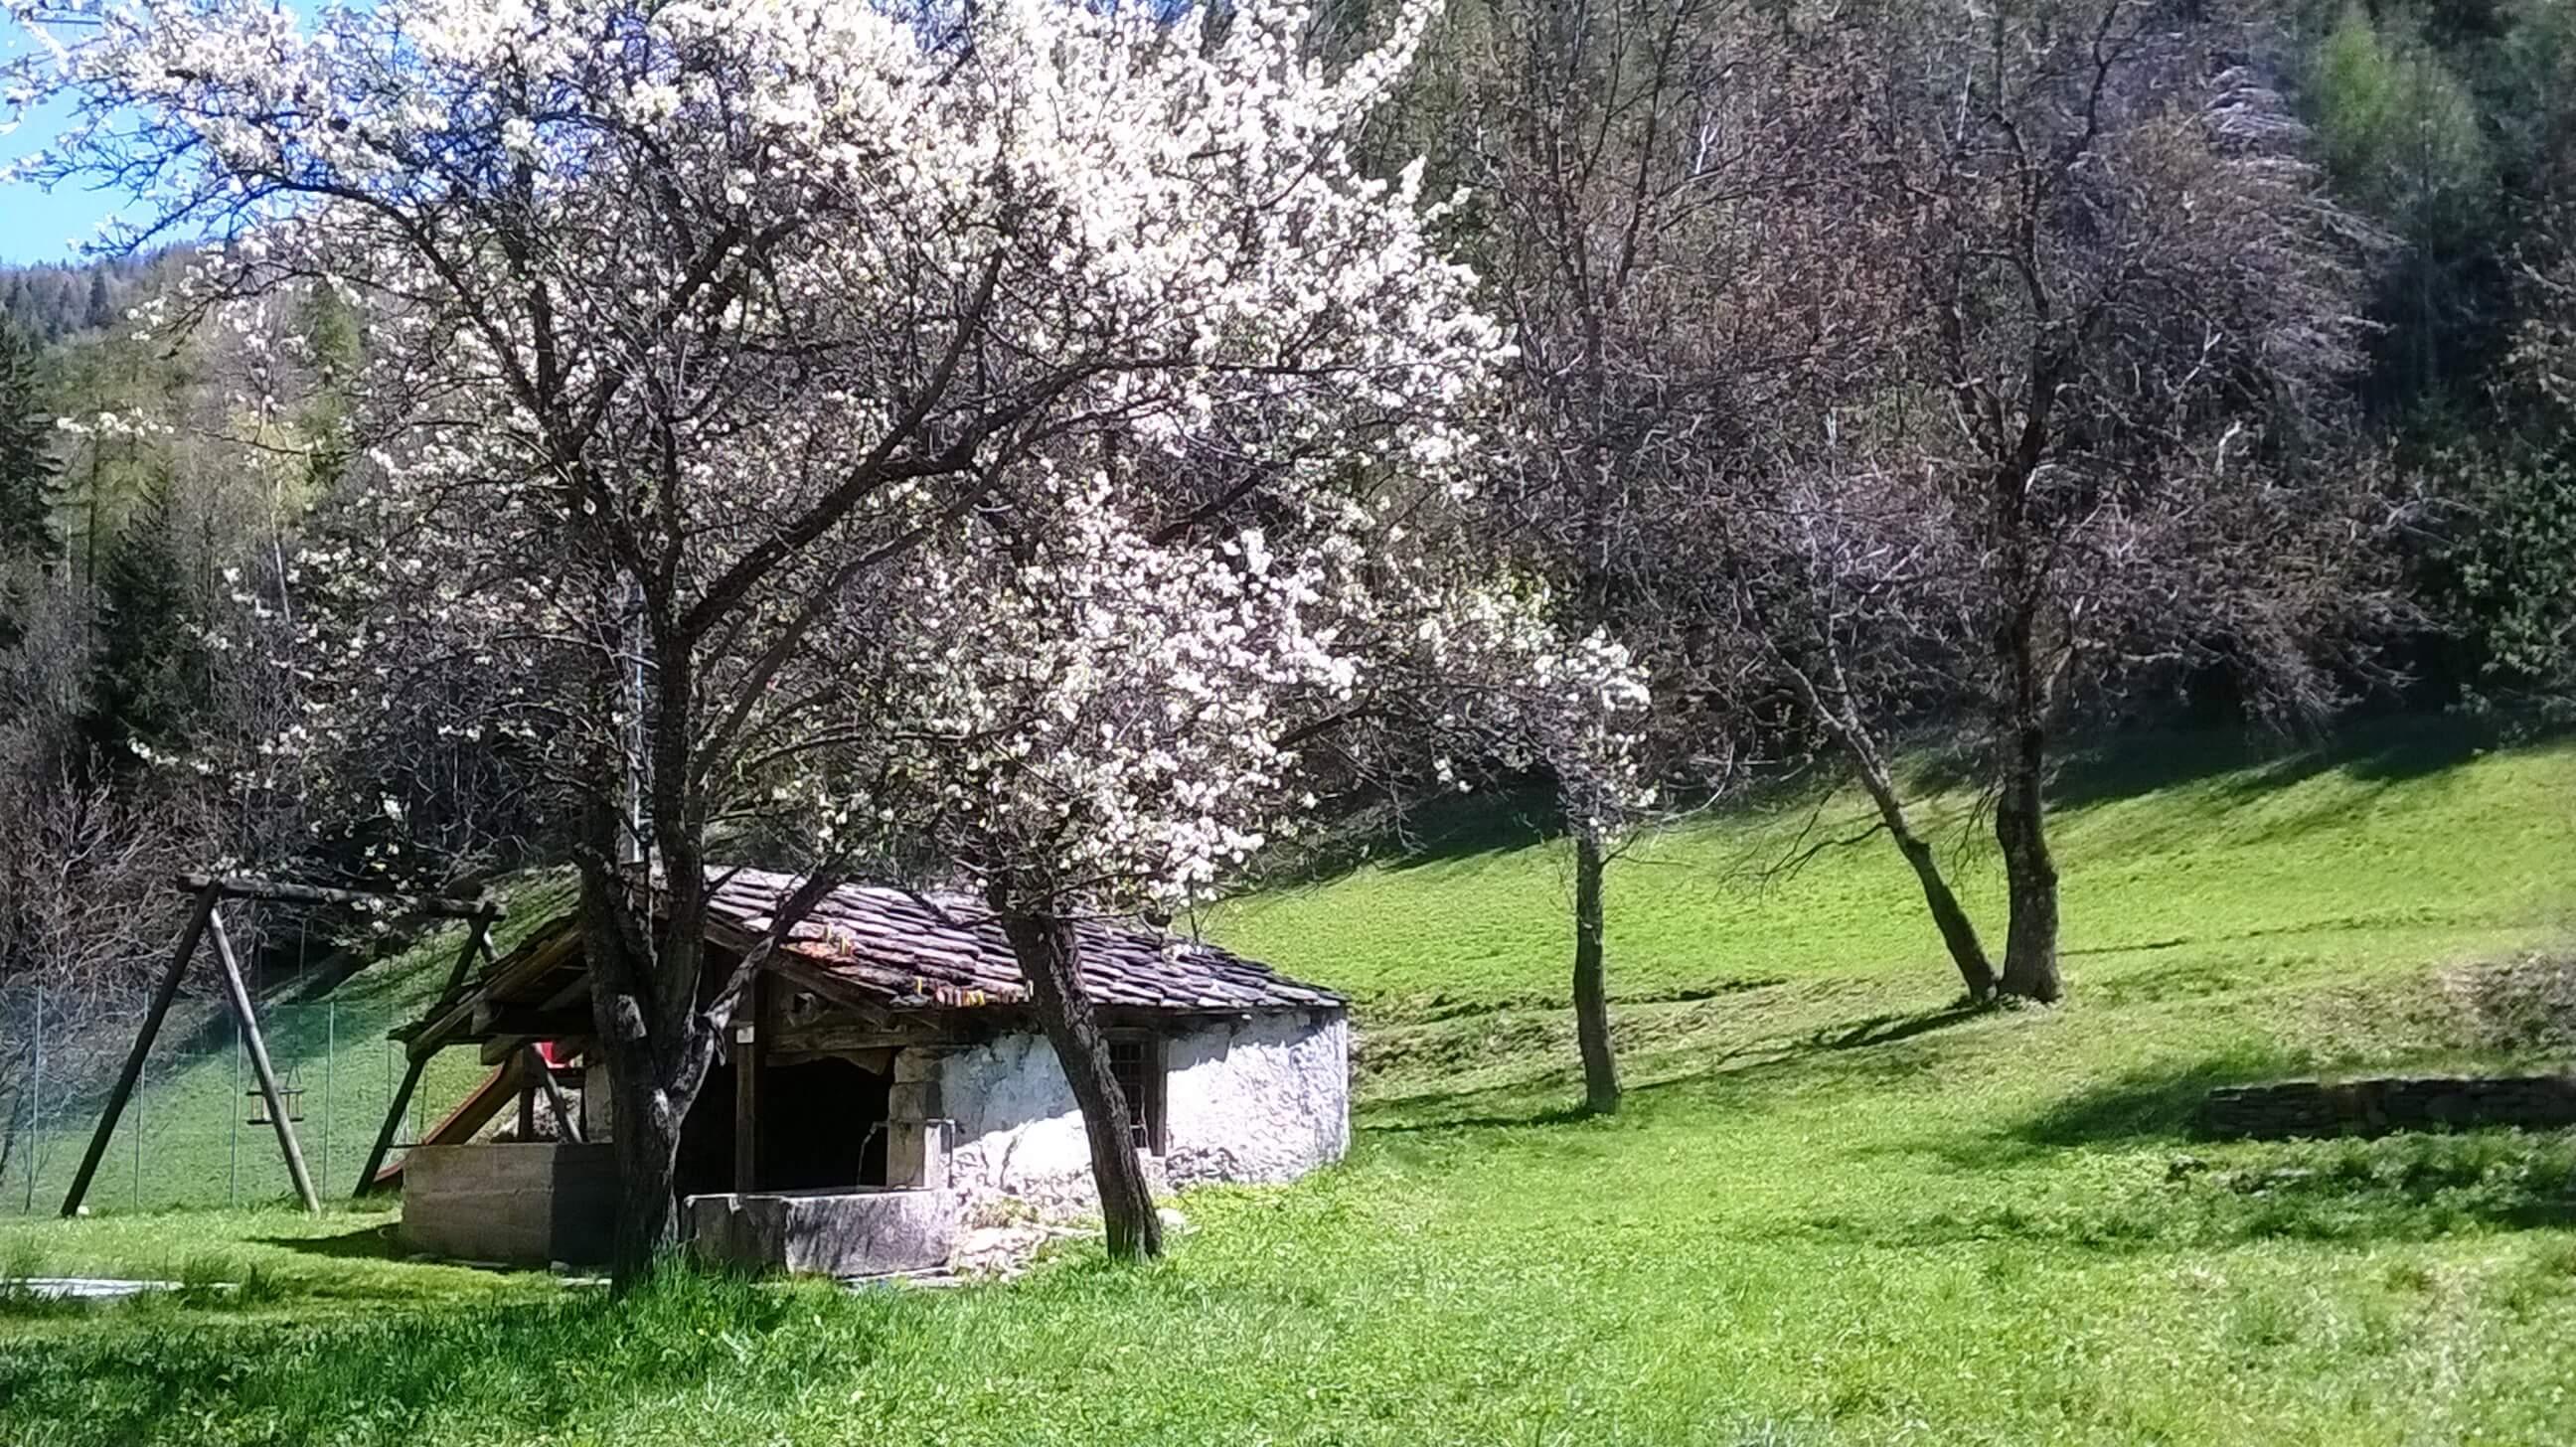 casegranparadiso-rhemessaintgeorges-primavera